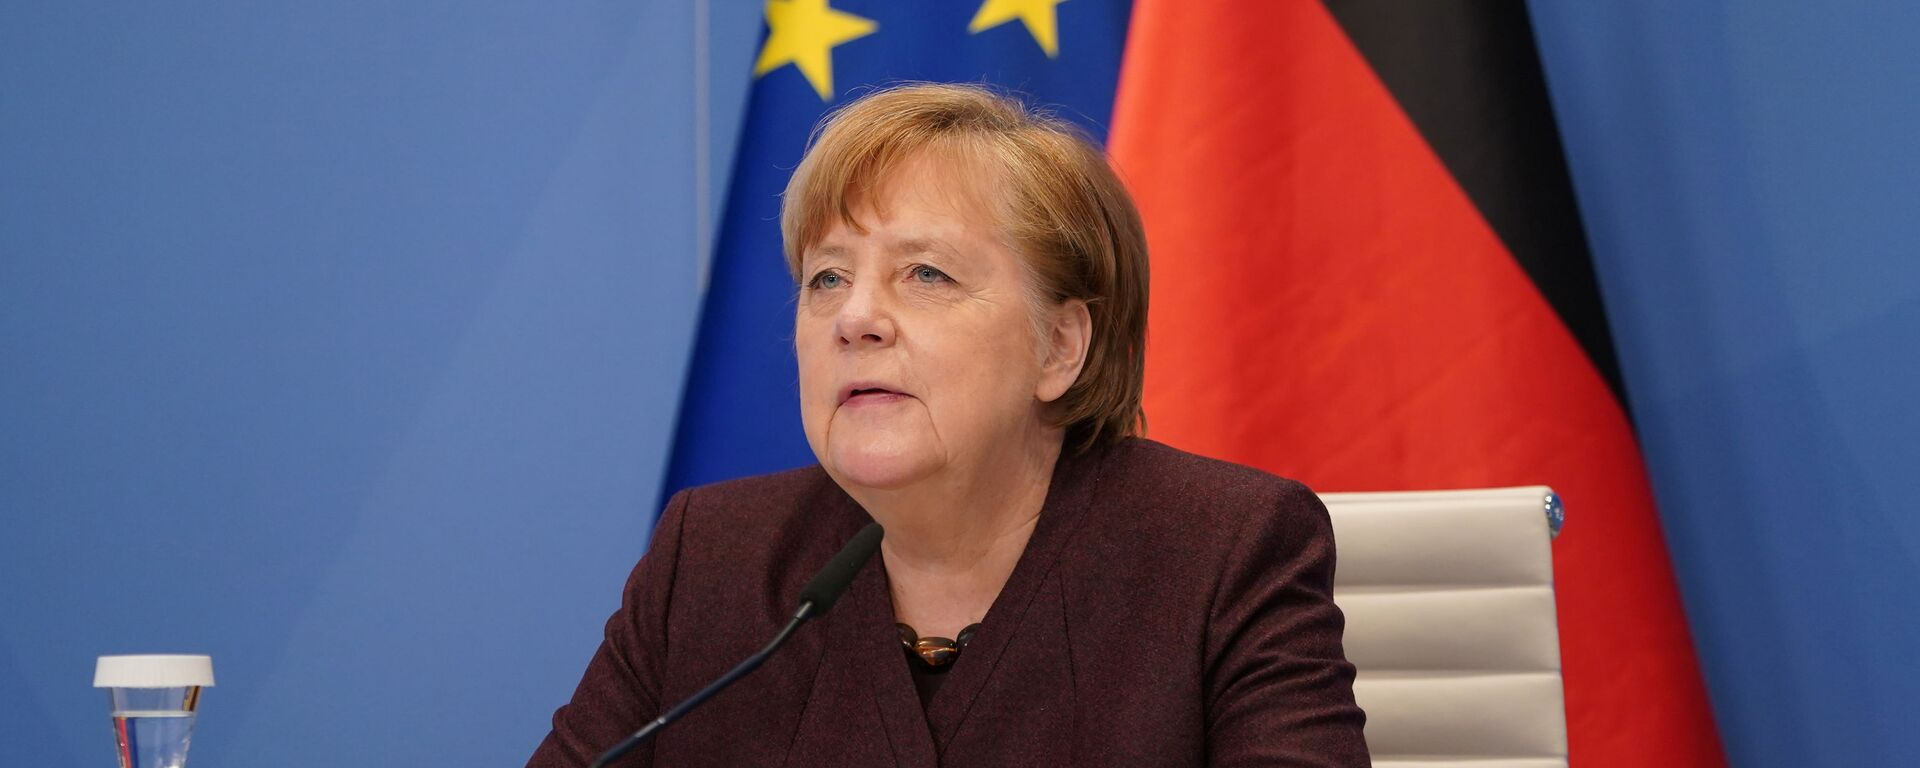 Angela Merkel, canciller alemana - Sputnik Mundo, 1920, 19.03.2021